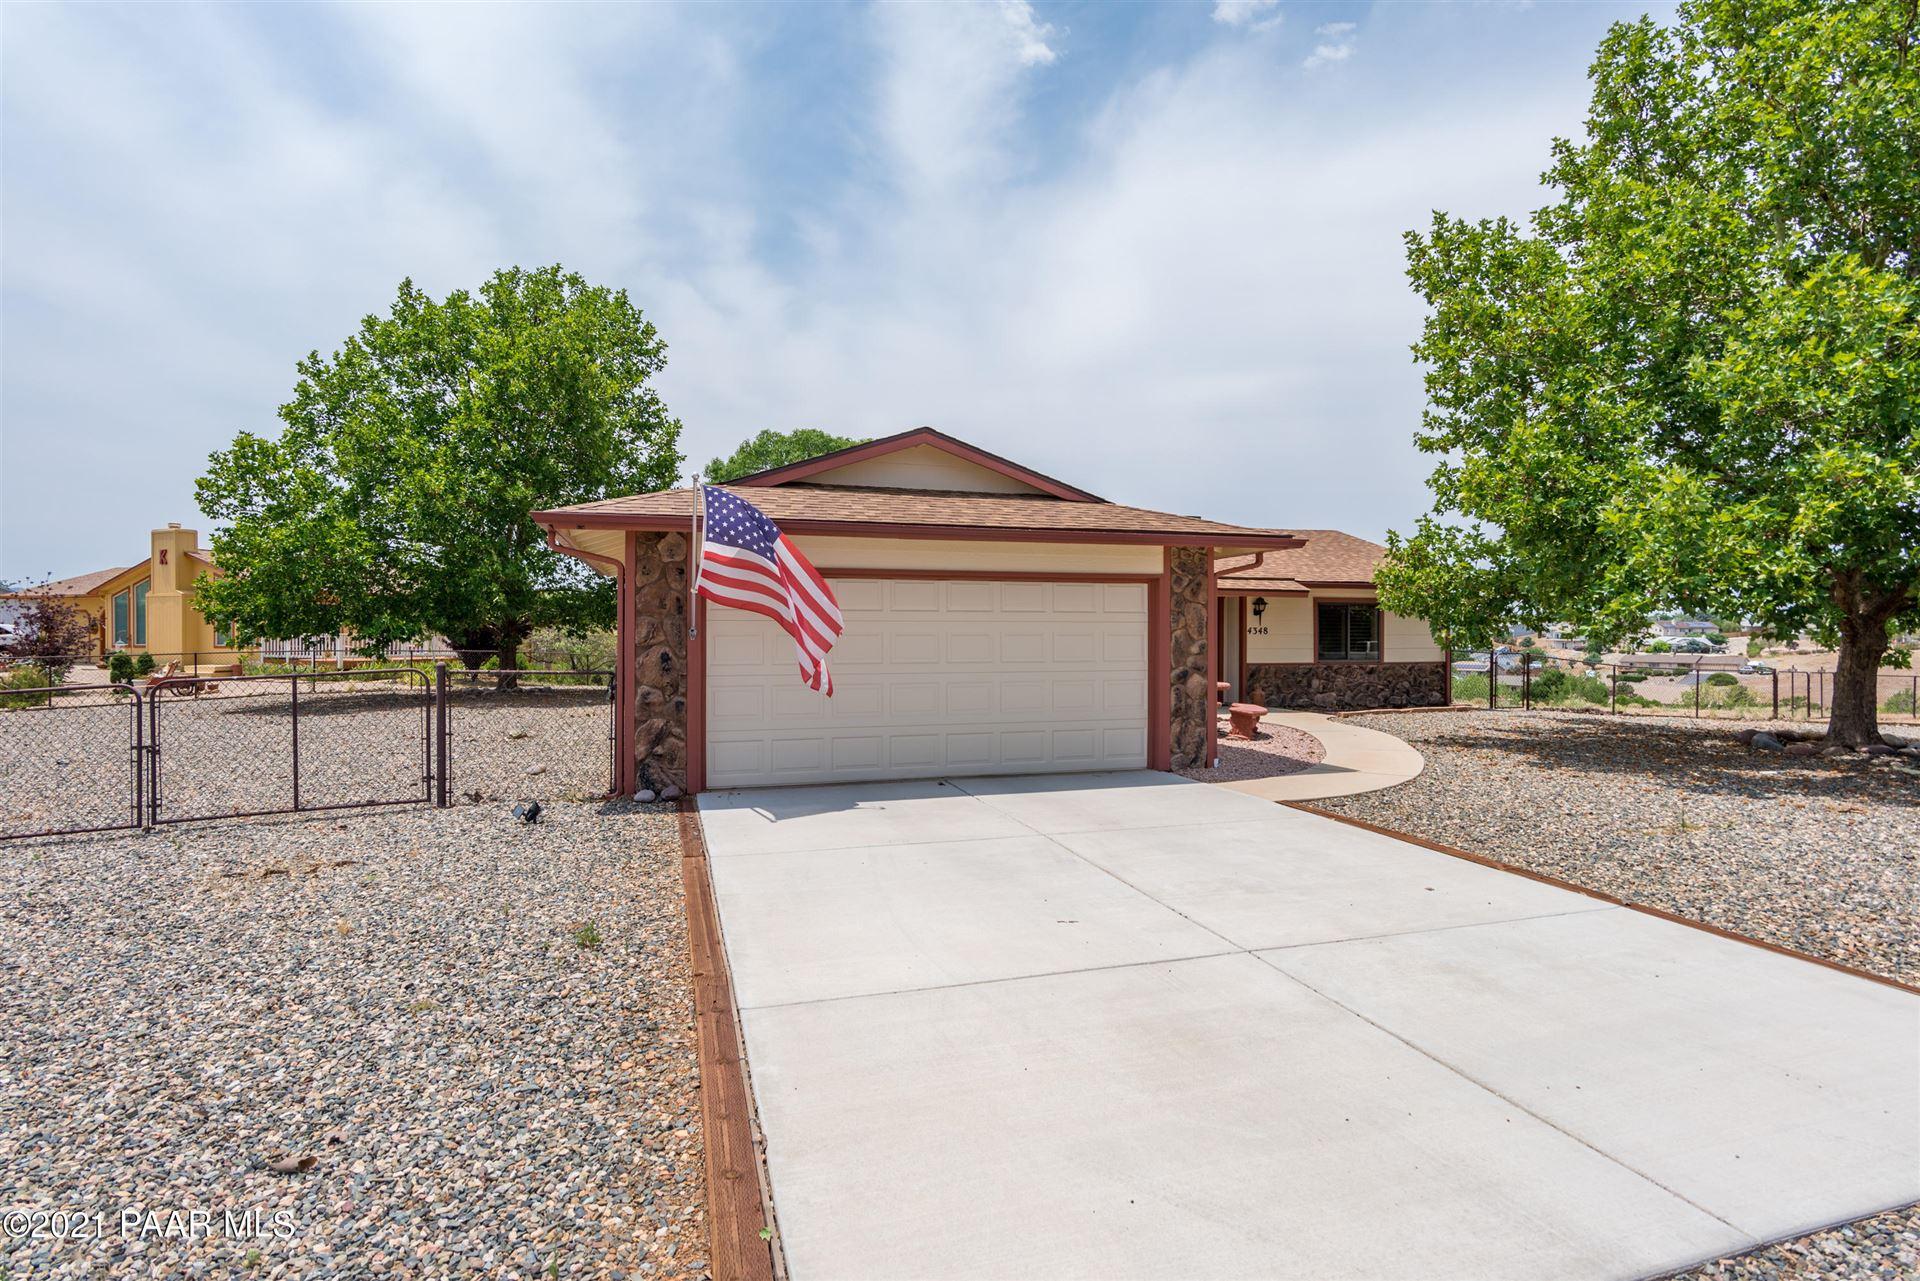 Photo of 4348 N Kearny Circle #Lot: 652, Prescott Valley, AZ 86314 (MLS # 1040403)